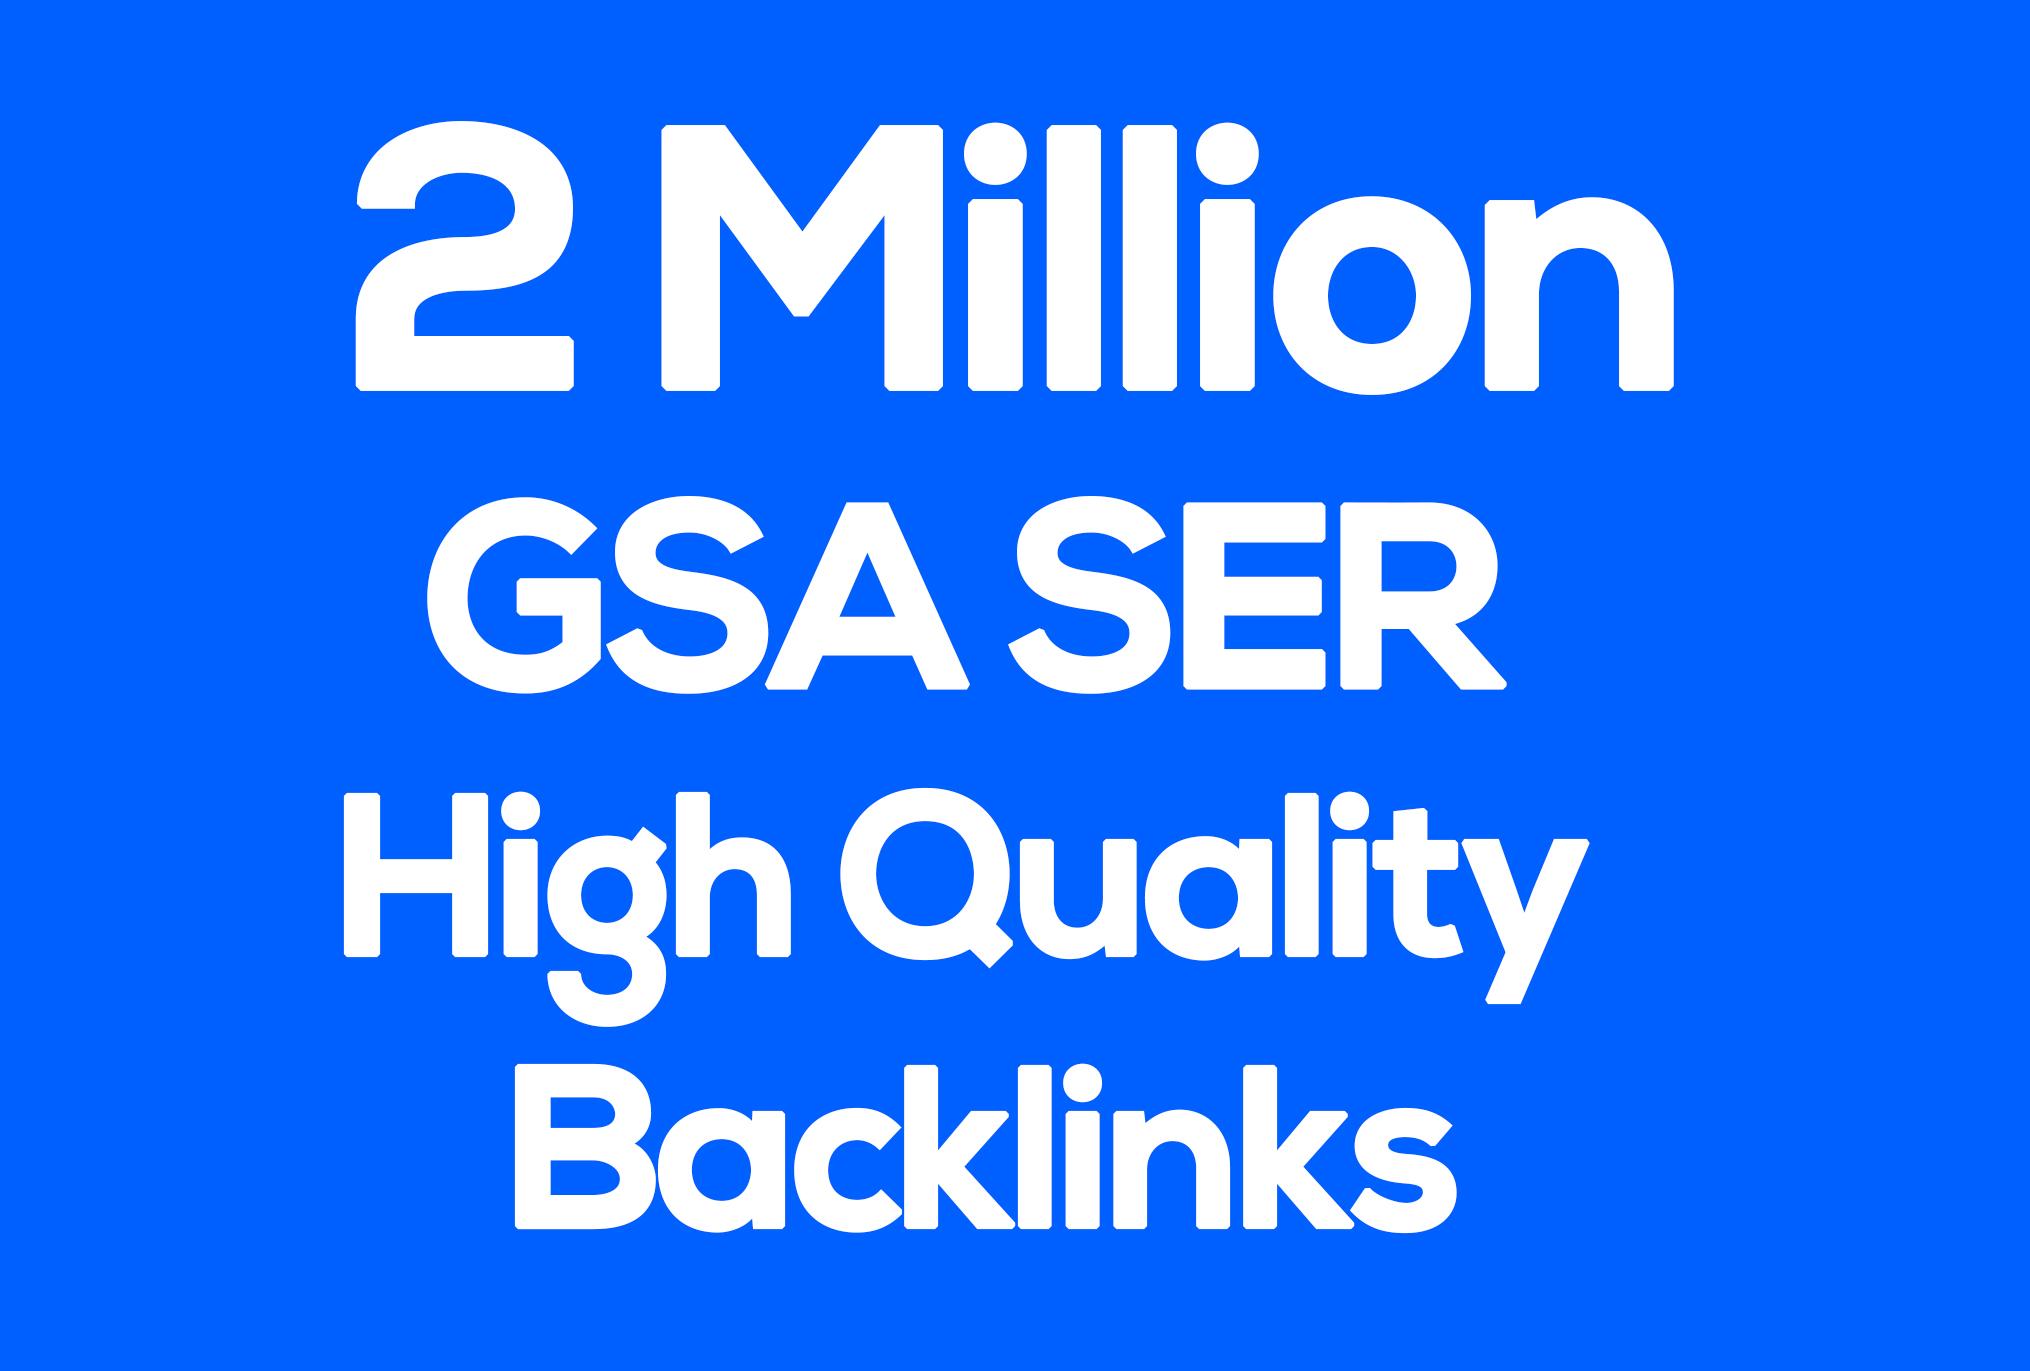 300k-High-Quality-GSA-SER-Backlinks-for-Multi-Tiered-link-Building